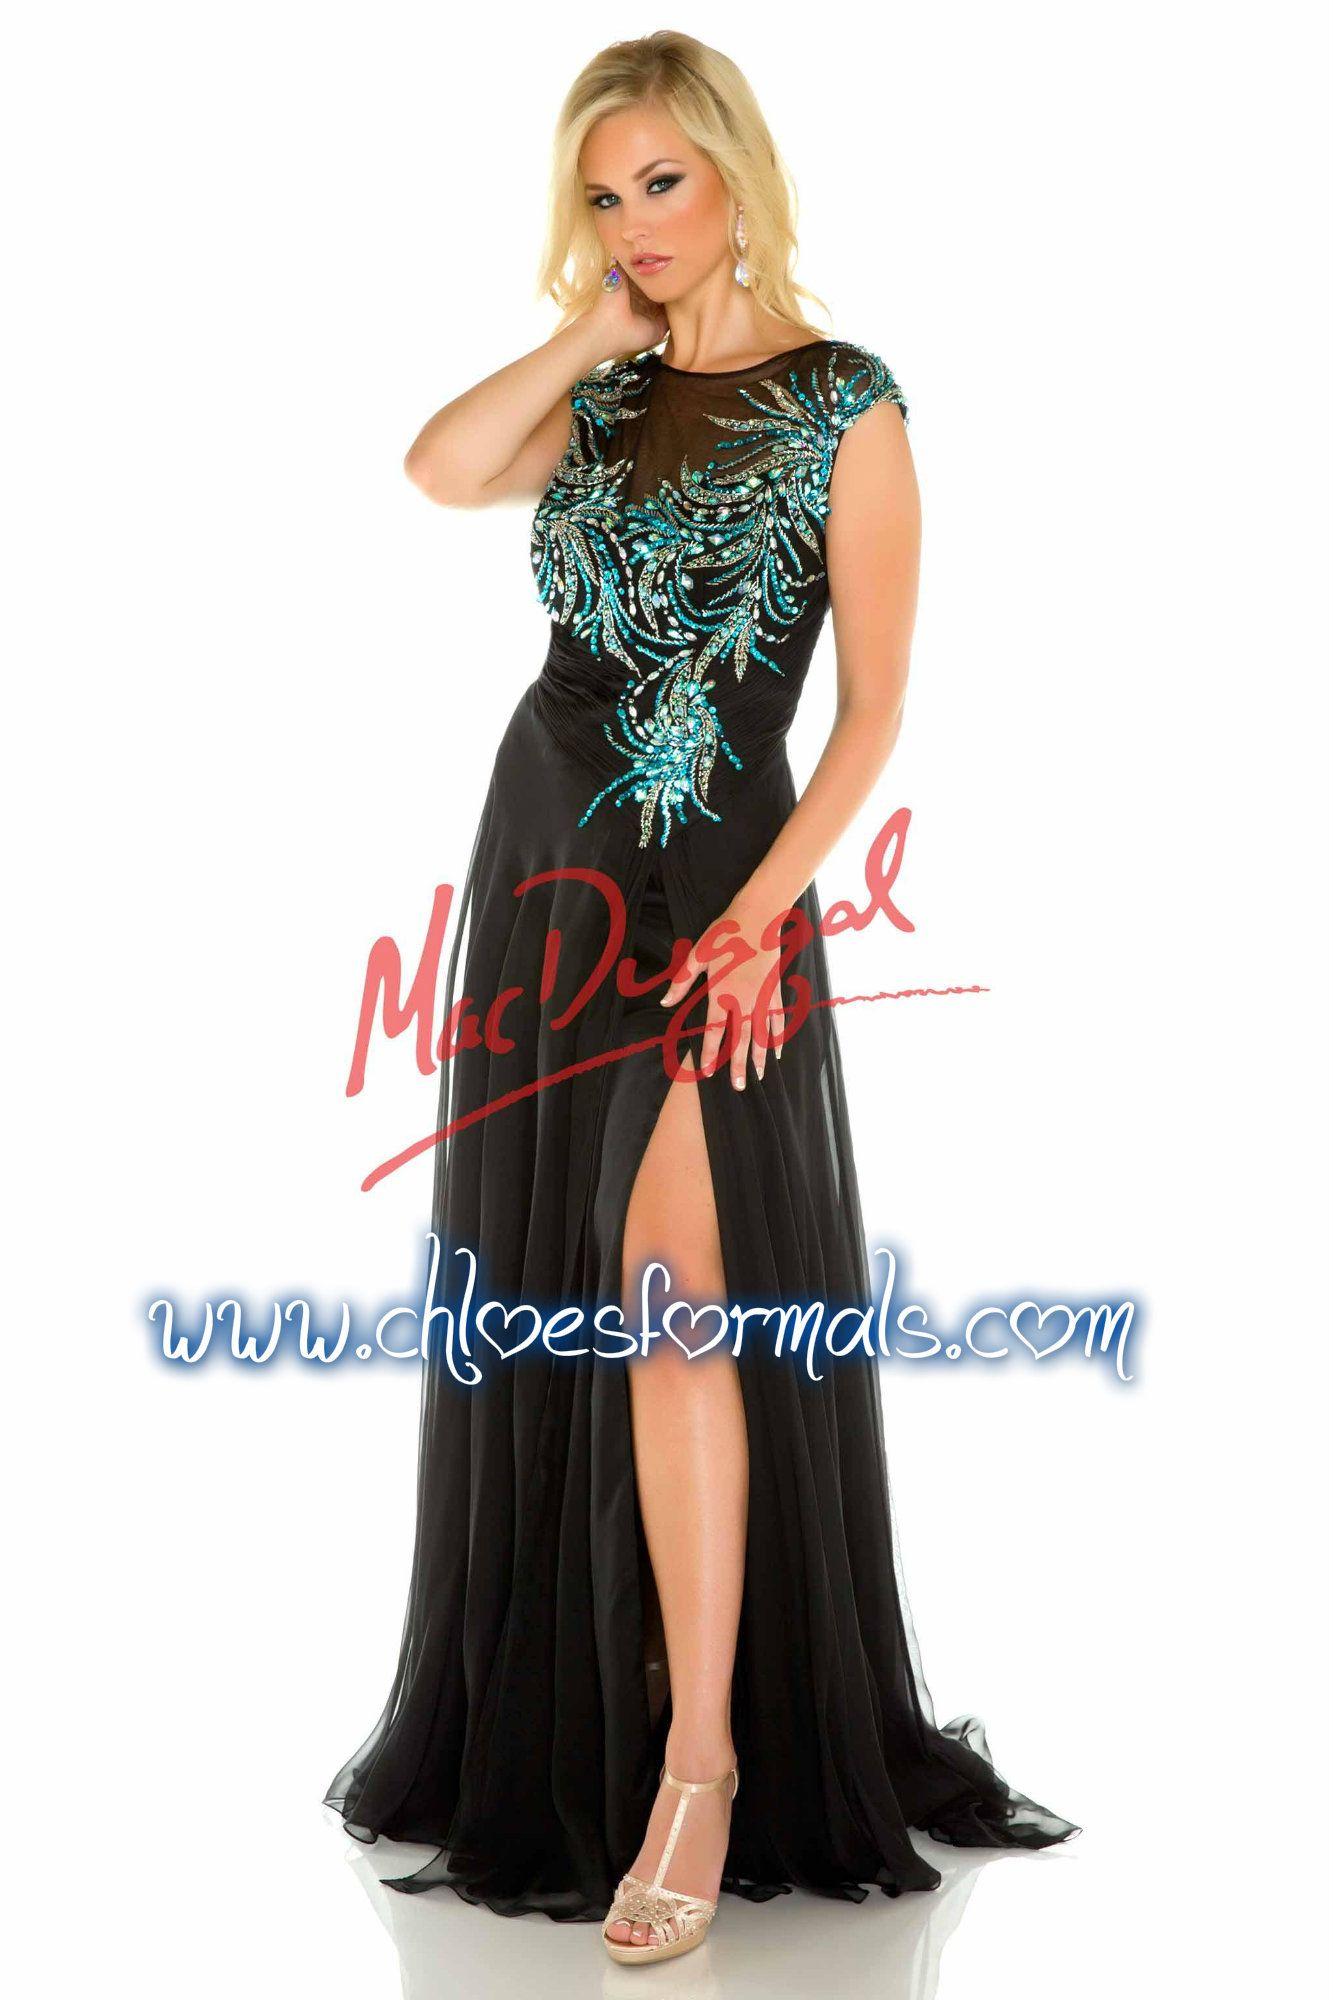 SZ 16W   Black/Peacock  Chloe's Choice Formals   256.847.3323